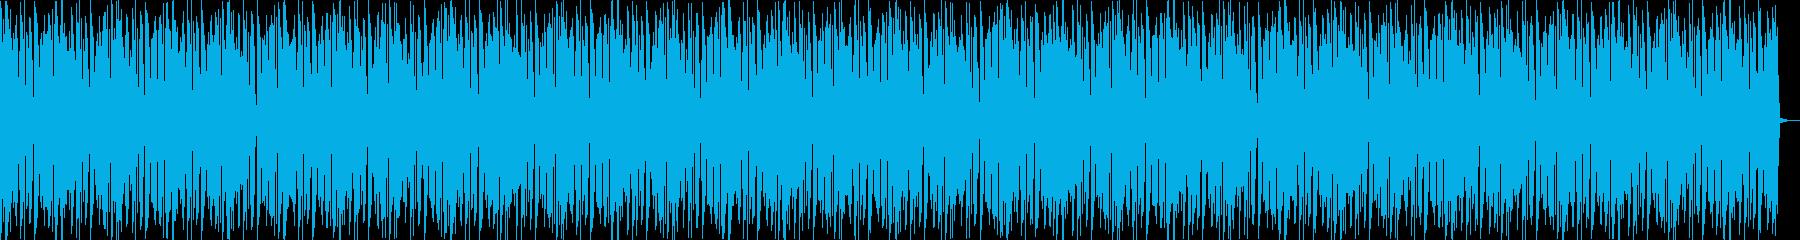 NEWSトピック、ゲーム、テクノロジーの再生済みの波形